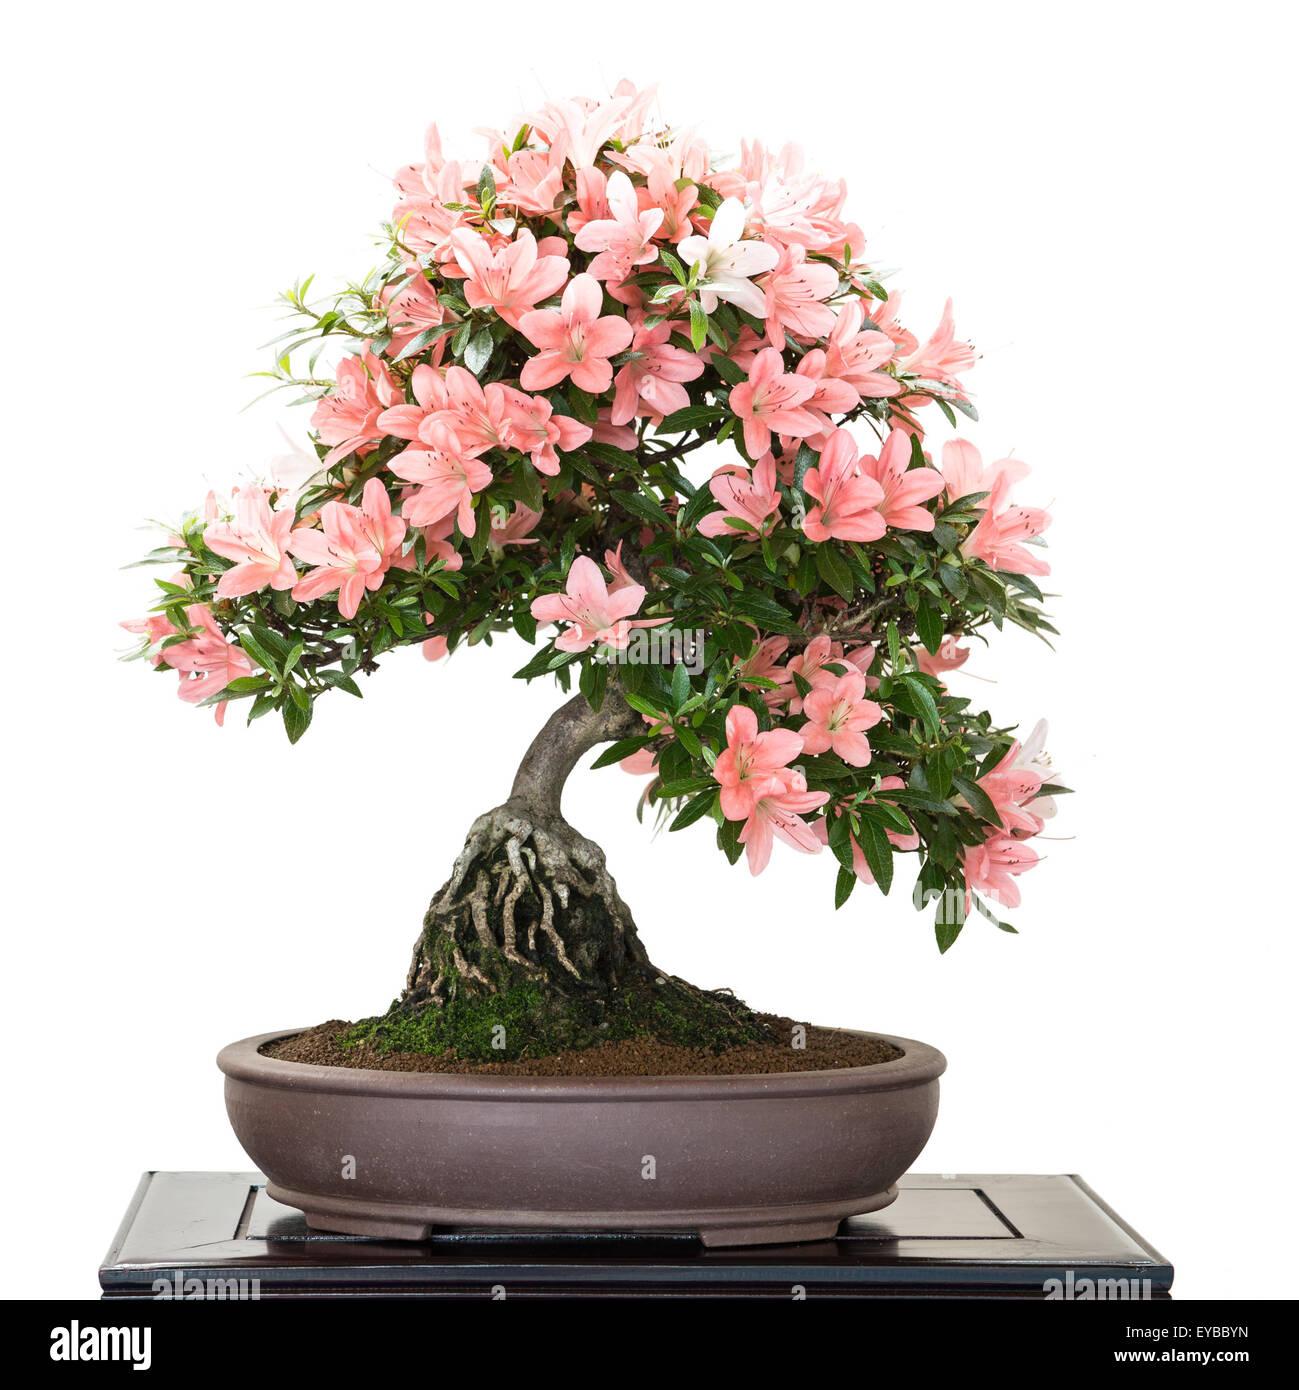 bonsai azalea stockfotos bonsai azalea bilder alamy. Black Bedroom Furniture Sets. Home Design Ideas